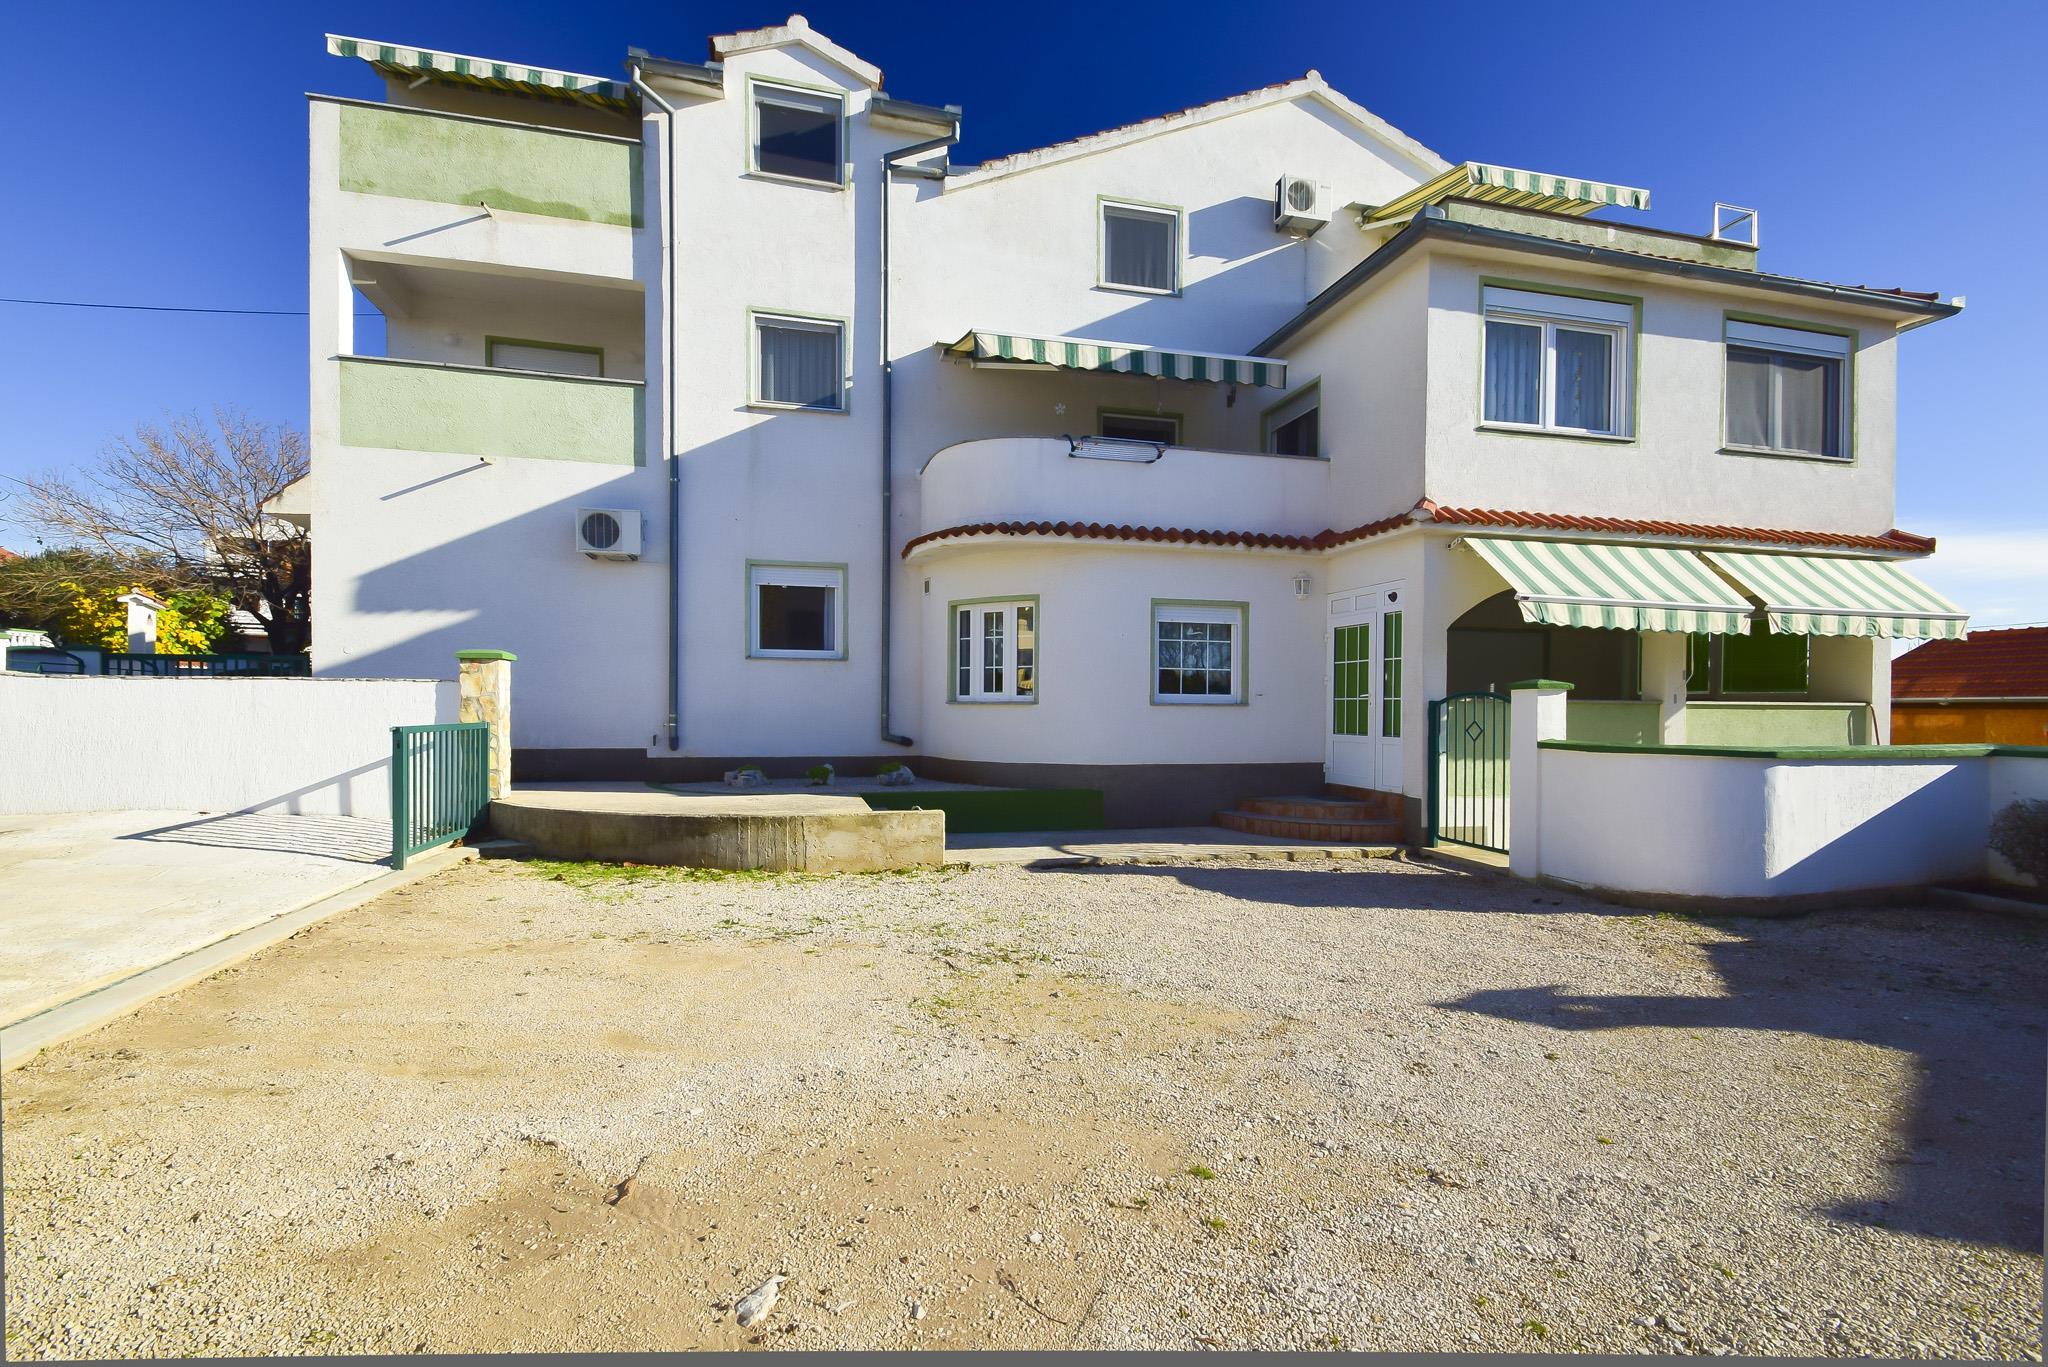 Ferienwohnung Apartments Sanja / Two bedrooms A6 (1928313), Vodice, , Dalmatien, Kroatien, Bild 1